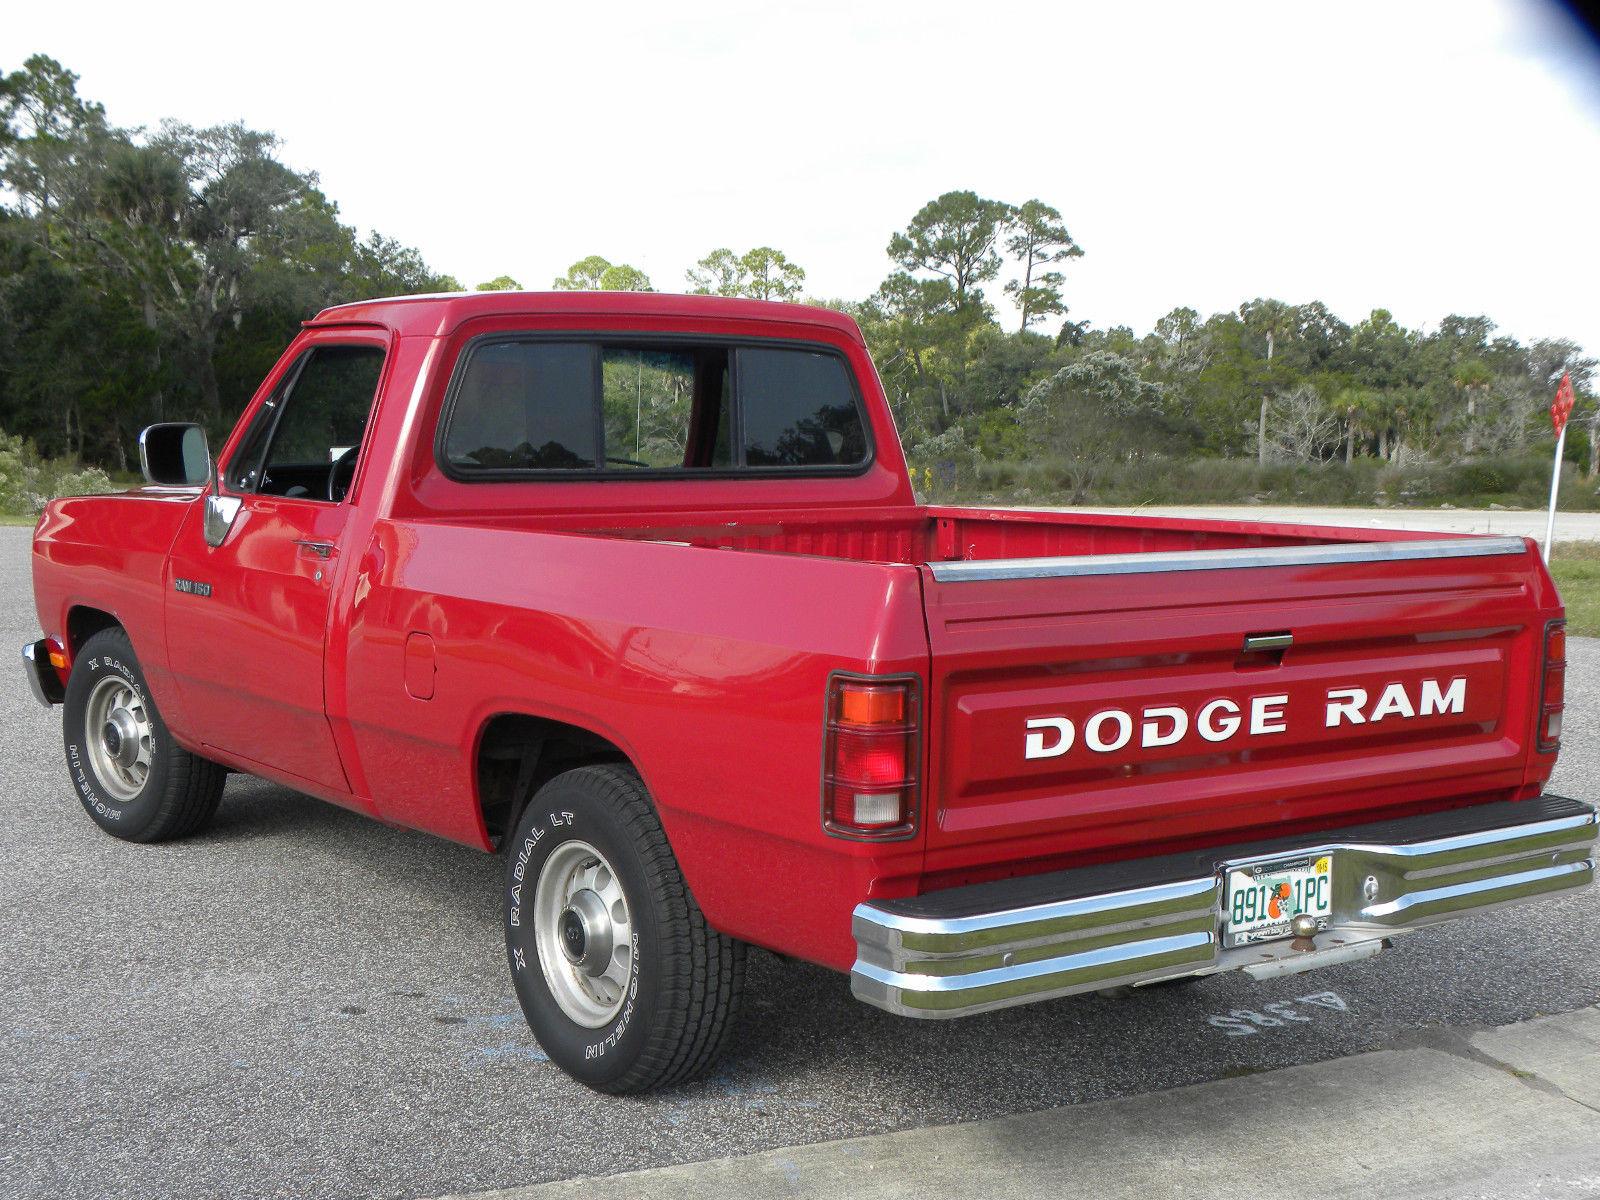 1991 dodge ram 1500 d150 red low miles very nice. Black Bedroom Furniture Sets. Home Design Ideas